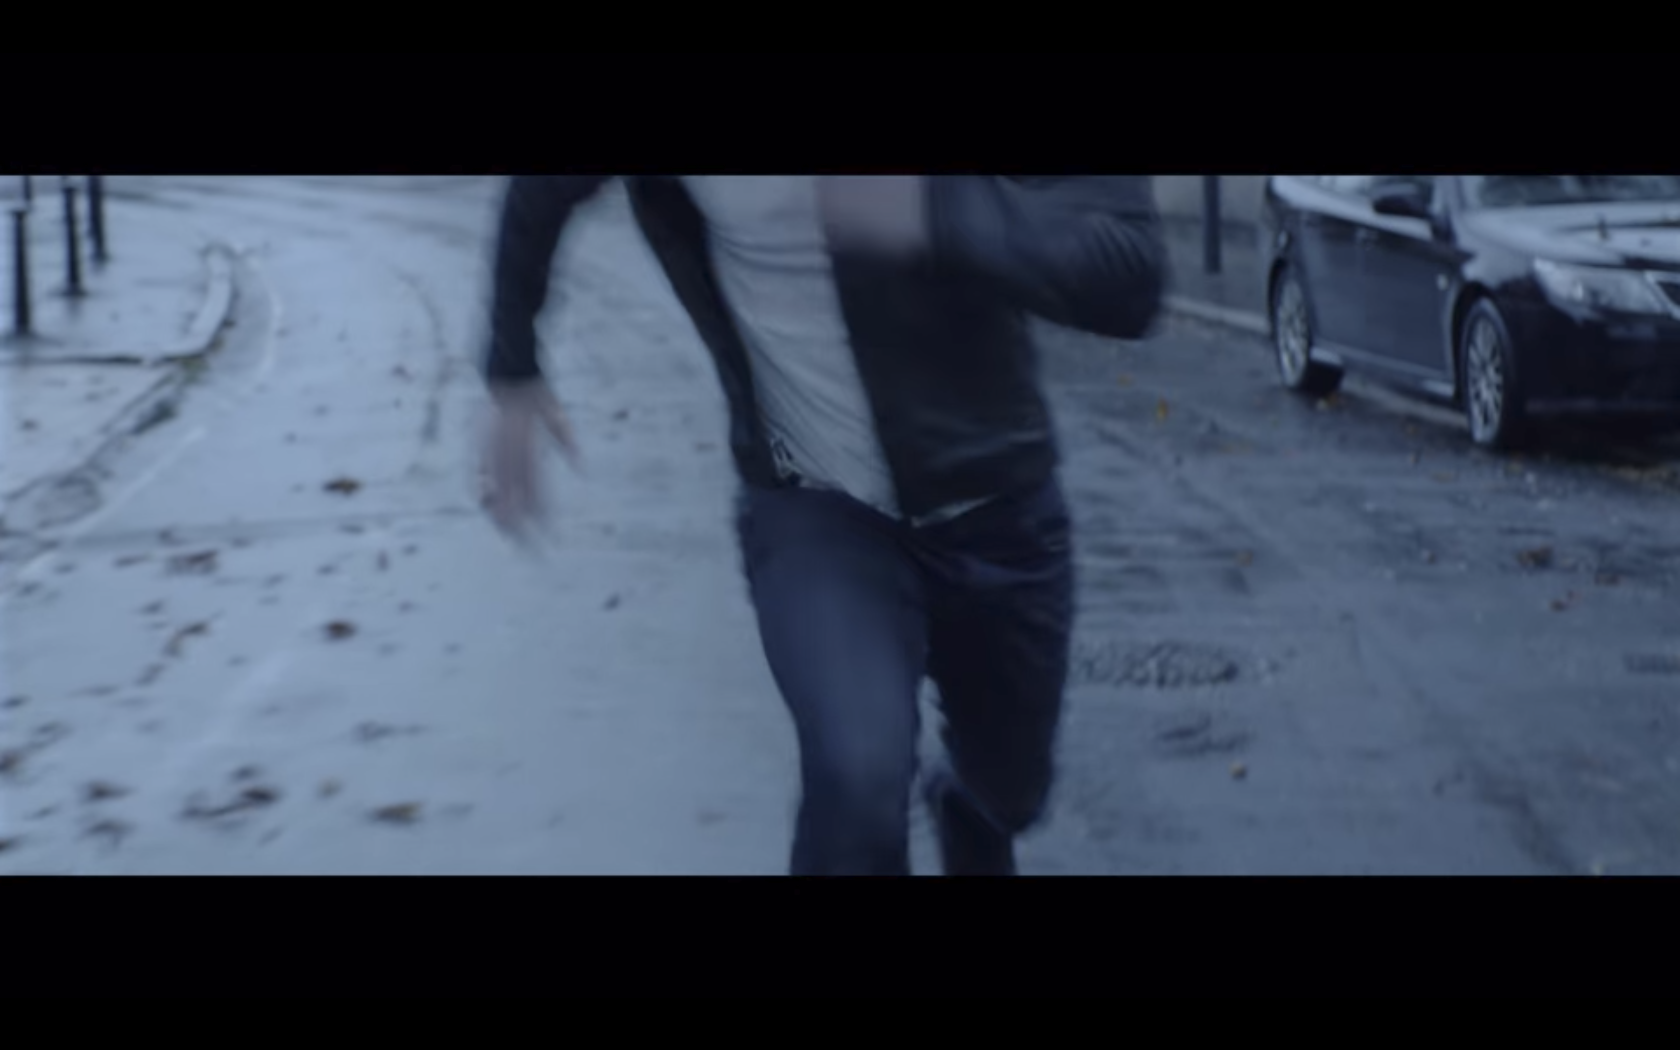 Steve Running legs and torso